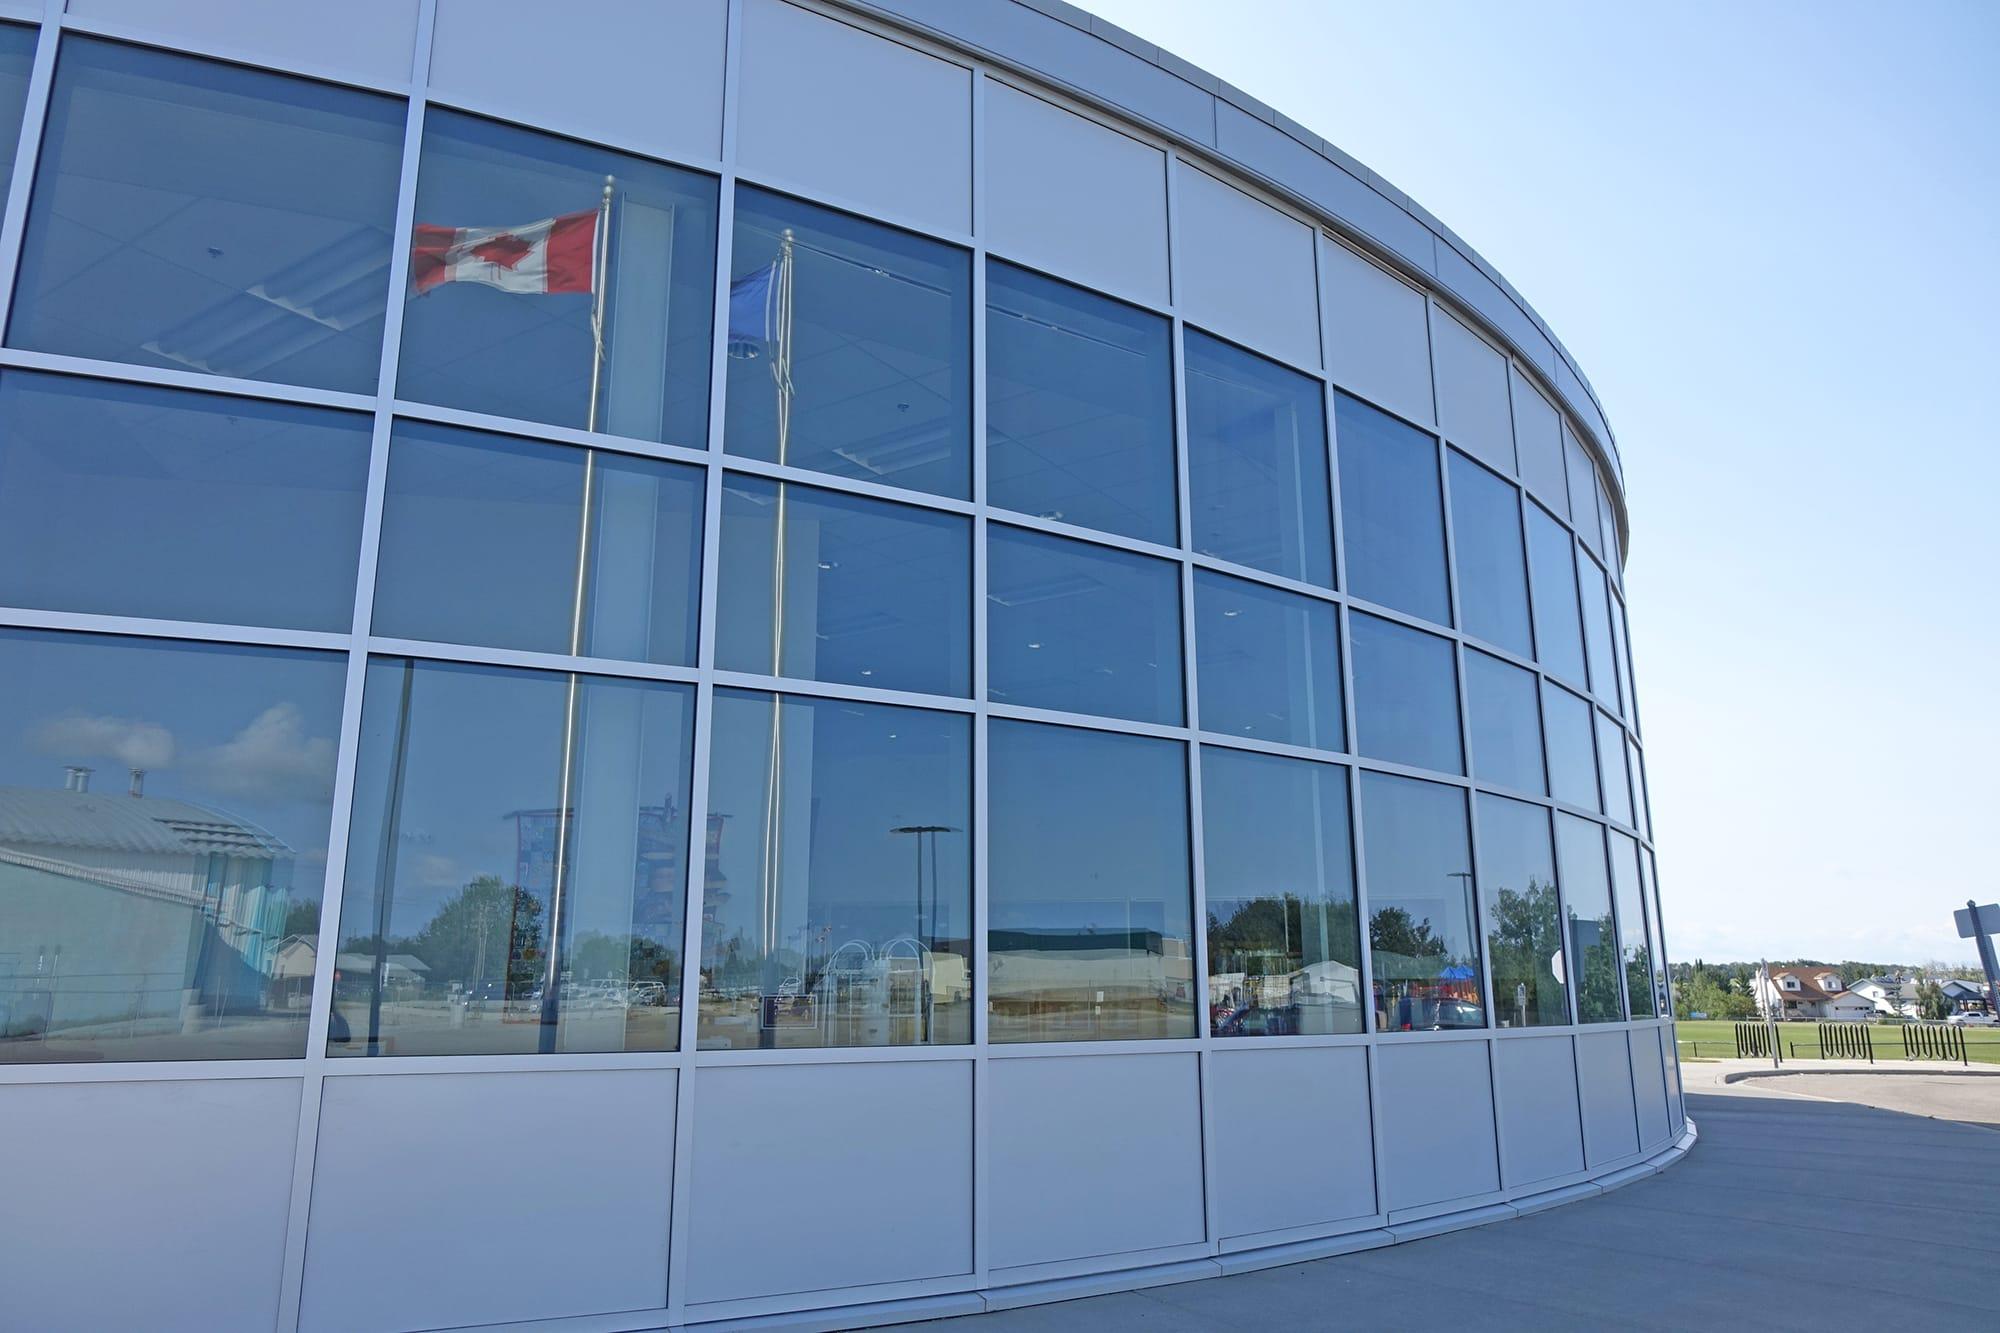 Robert W Zahara Public School exterior windows